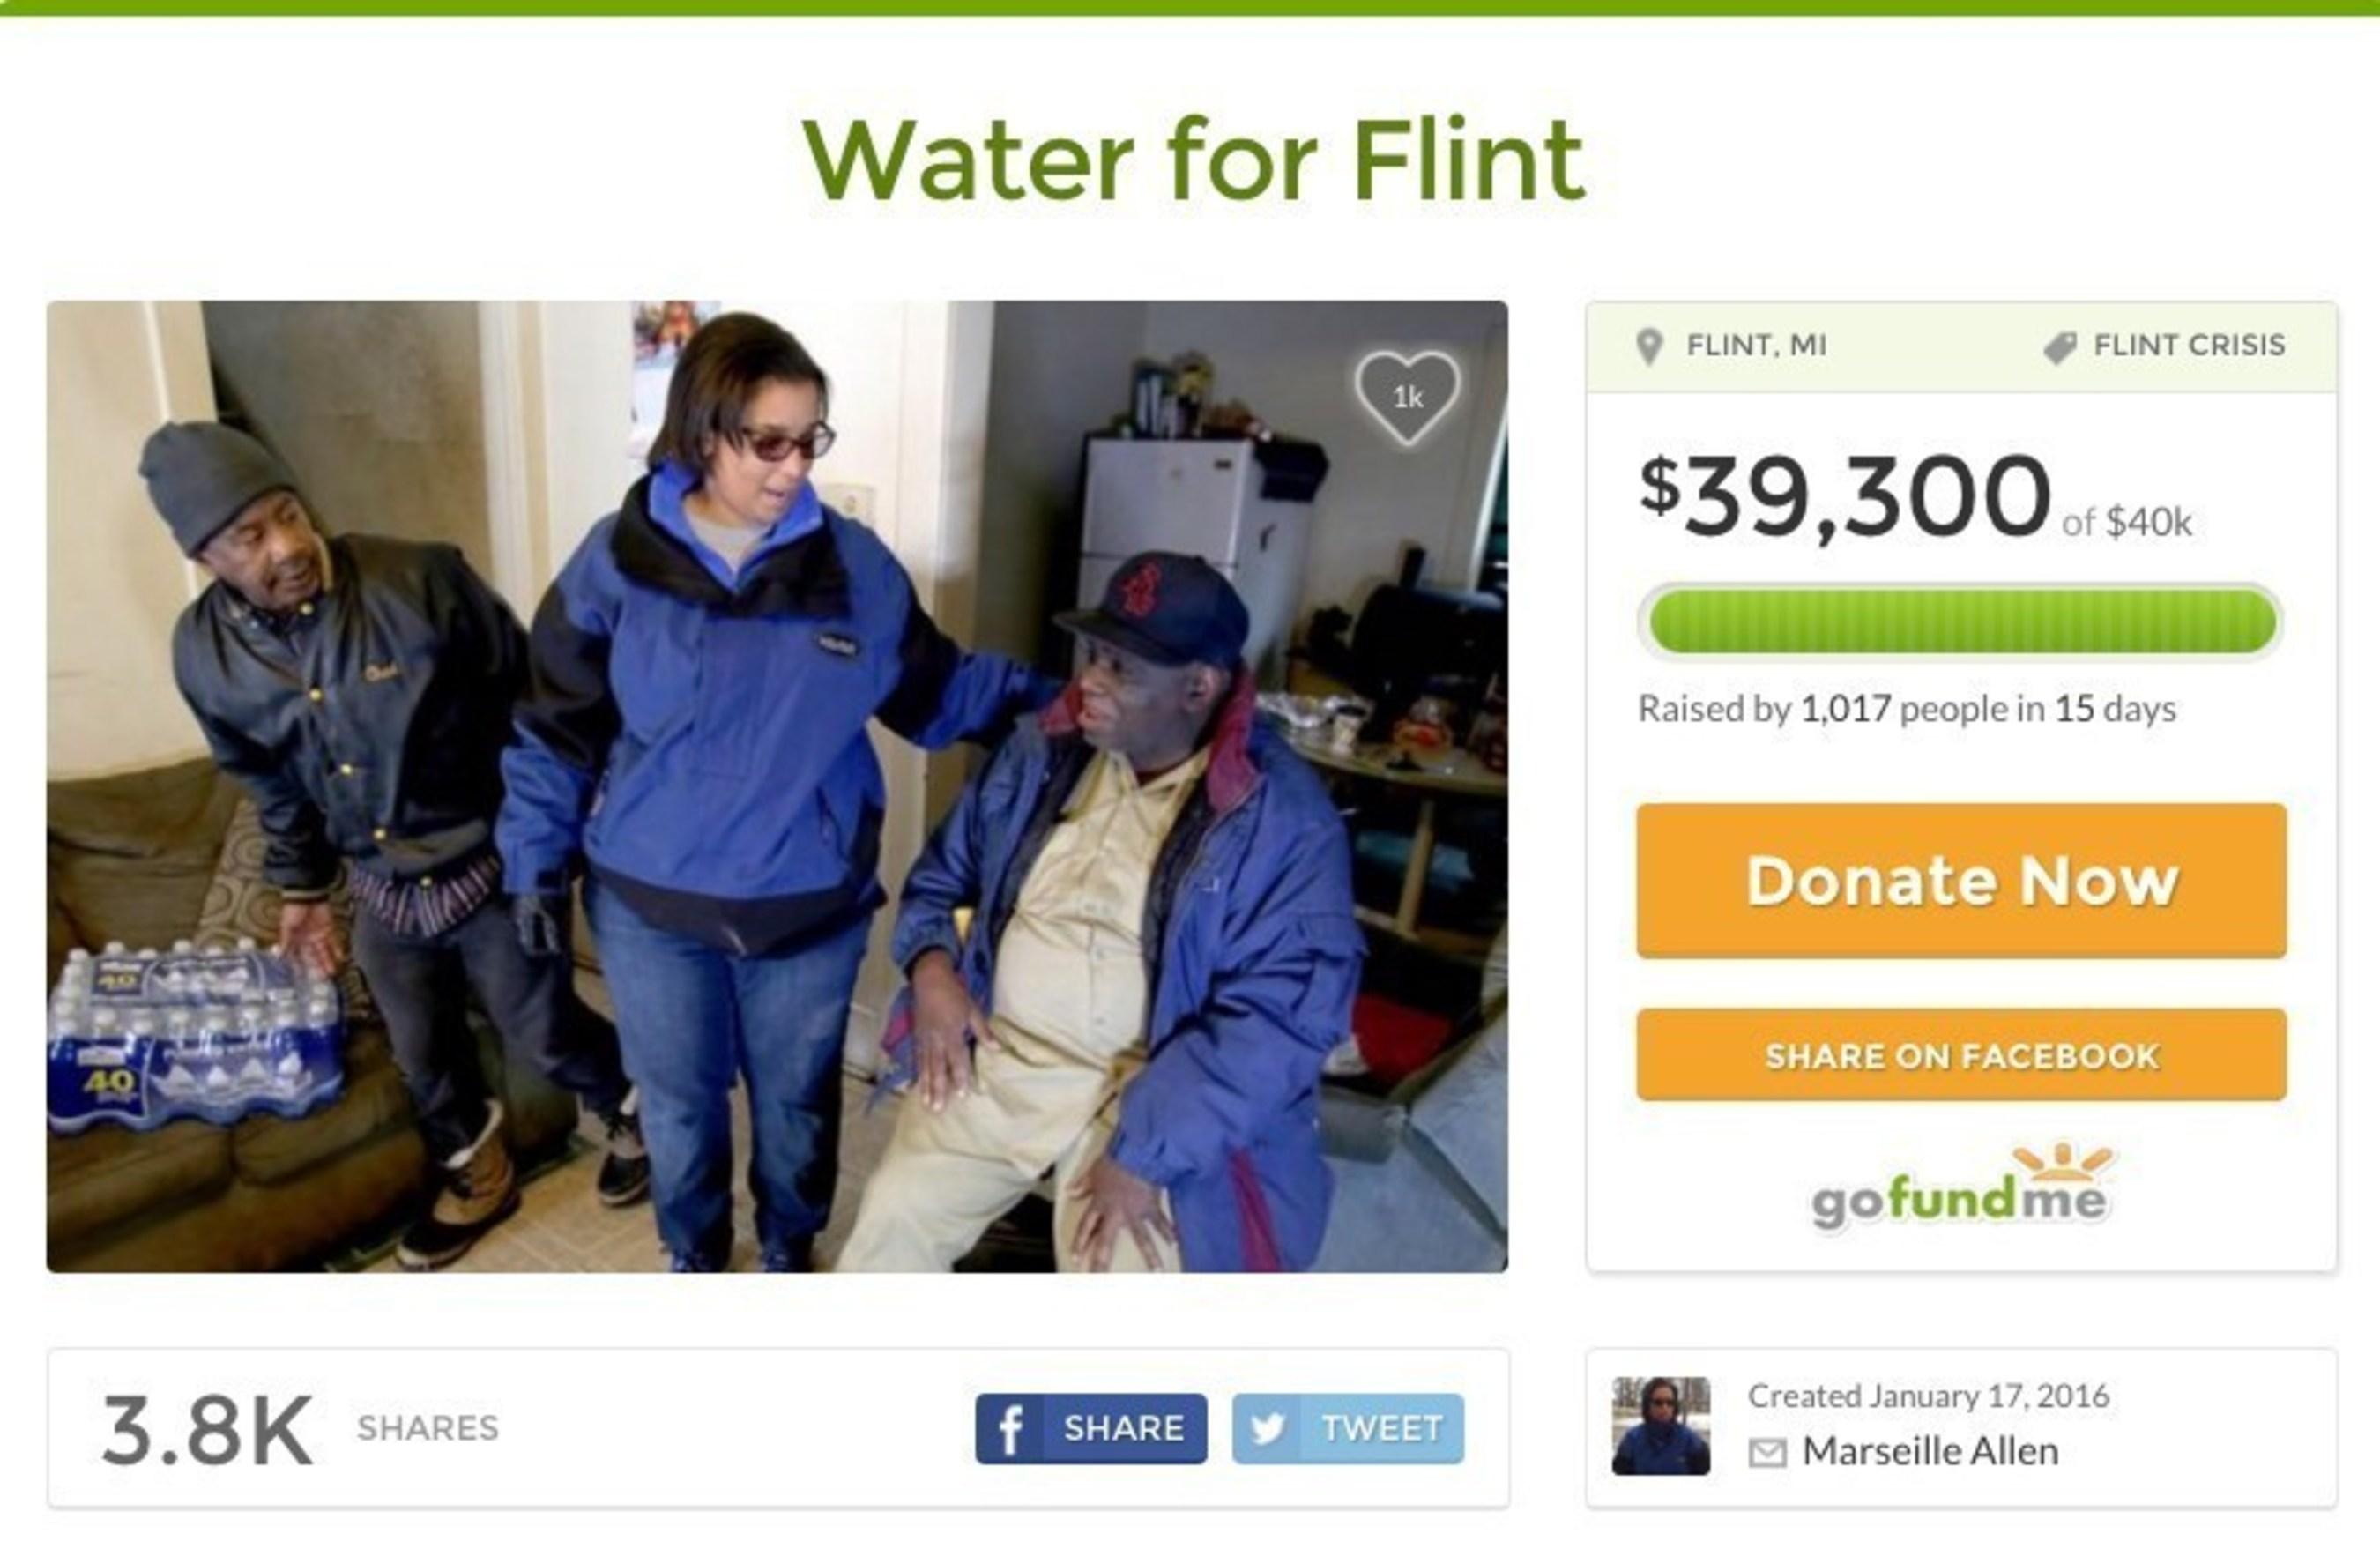 GoFundMe Challenge Raises $405K for Flint Water Crisis And Names Contest Winner